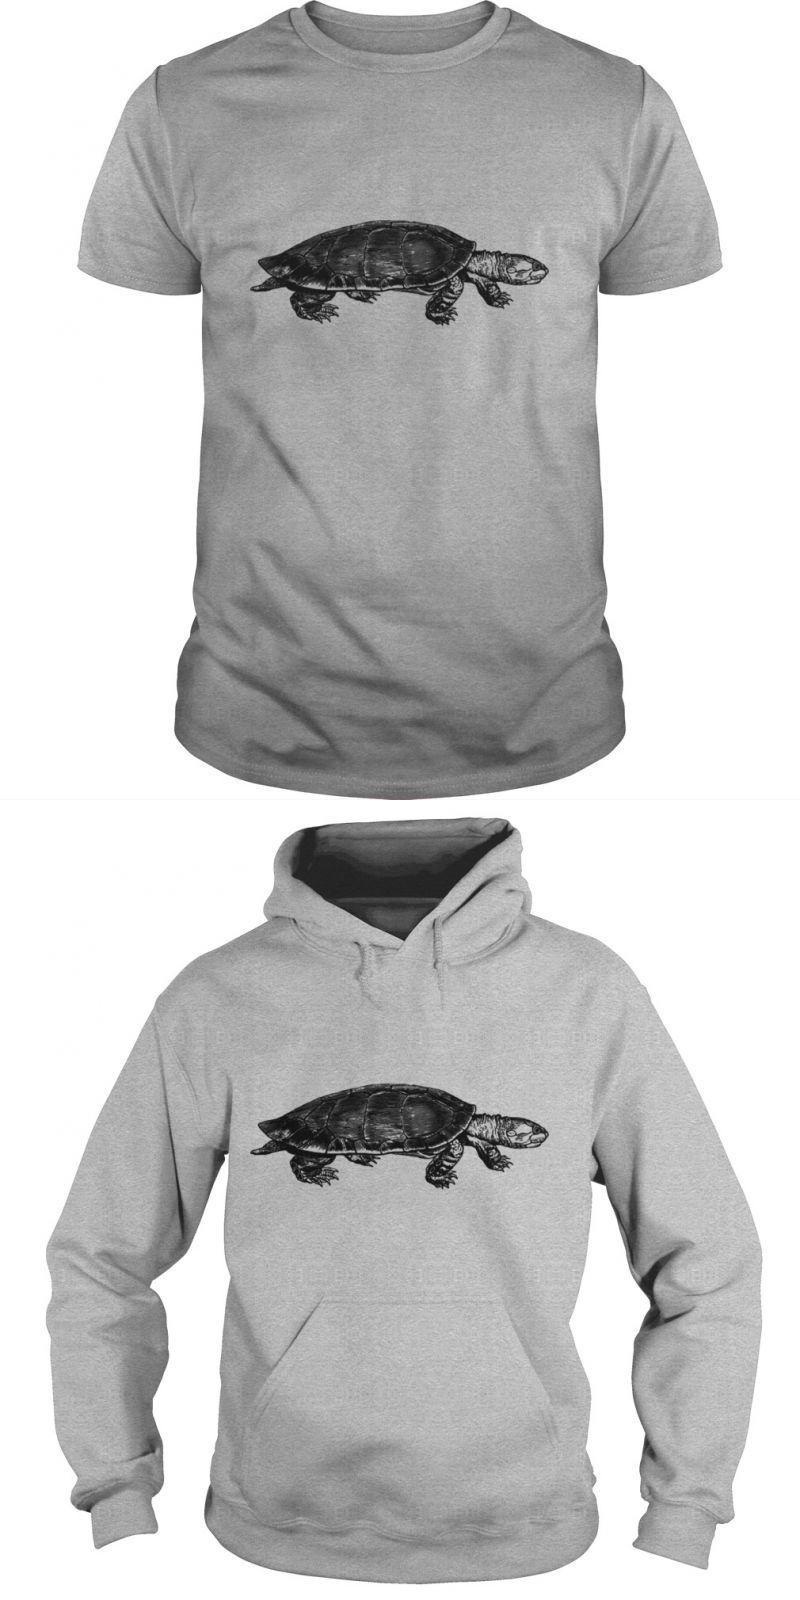 Yellow Spotted River Turtle Ninja Turtles T Shirt Amazon T Shirt